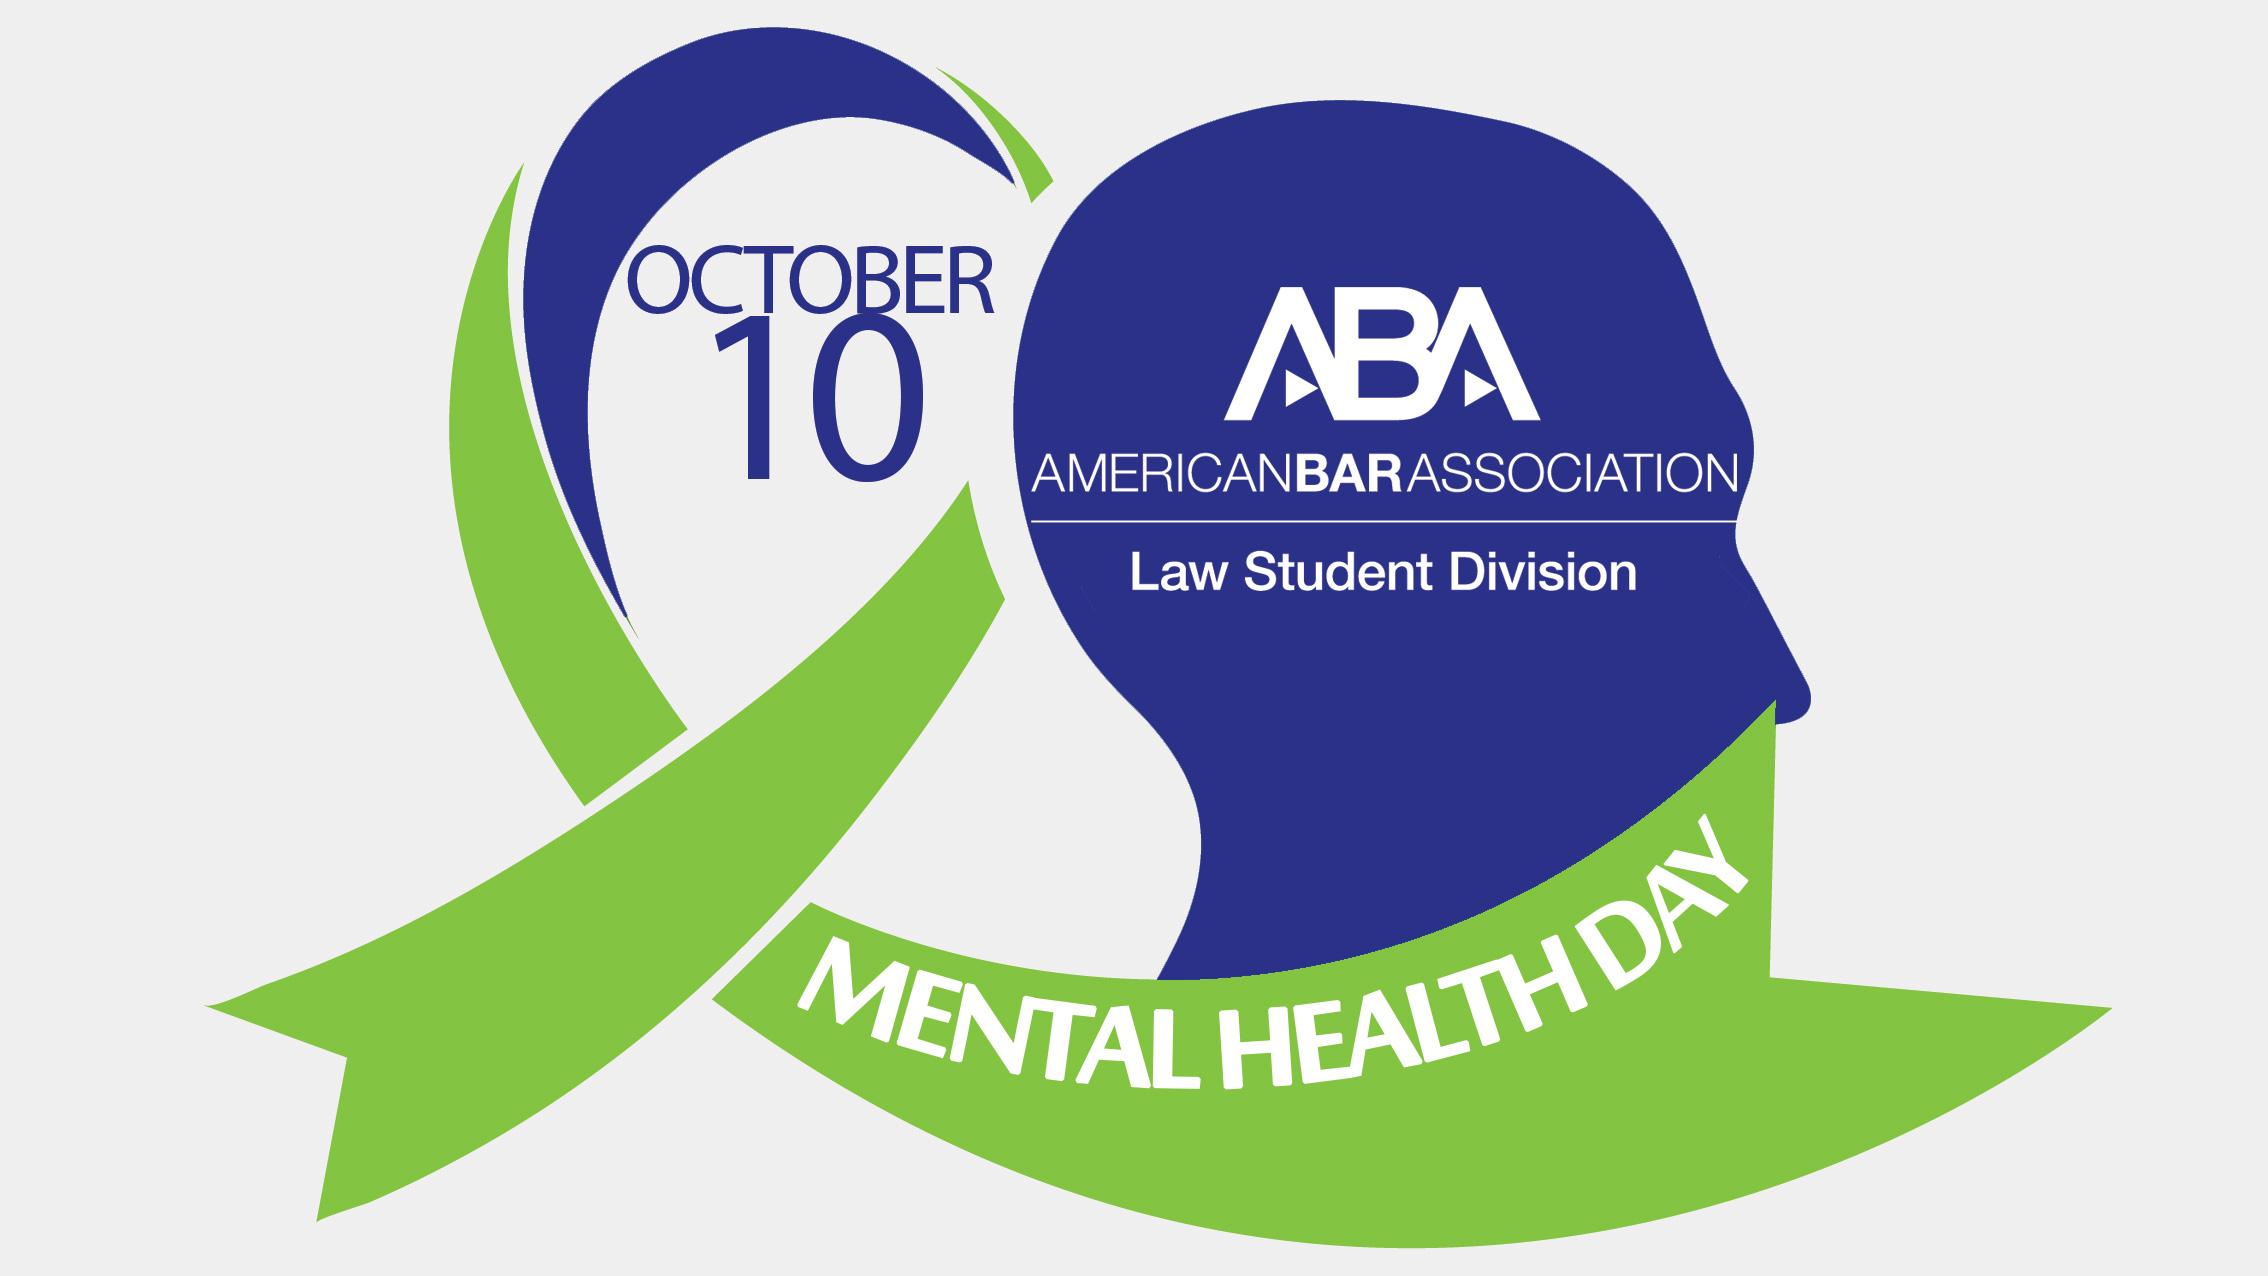 Mental Health Day Logo